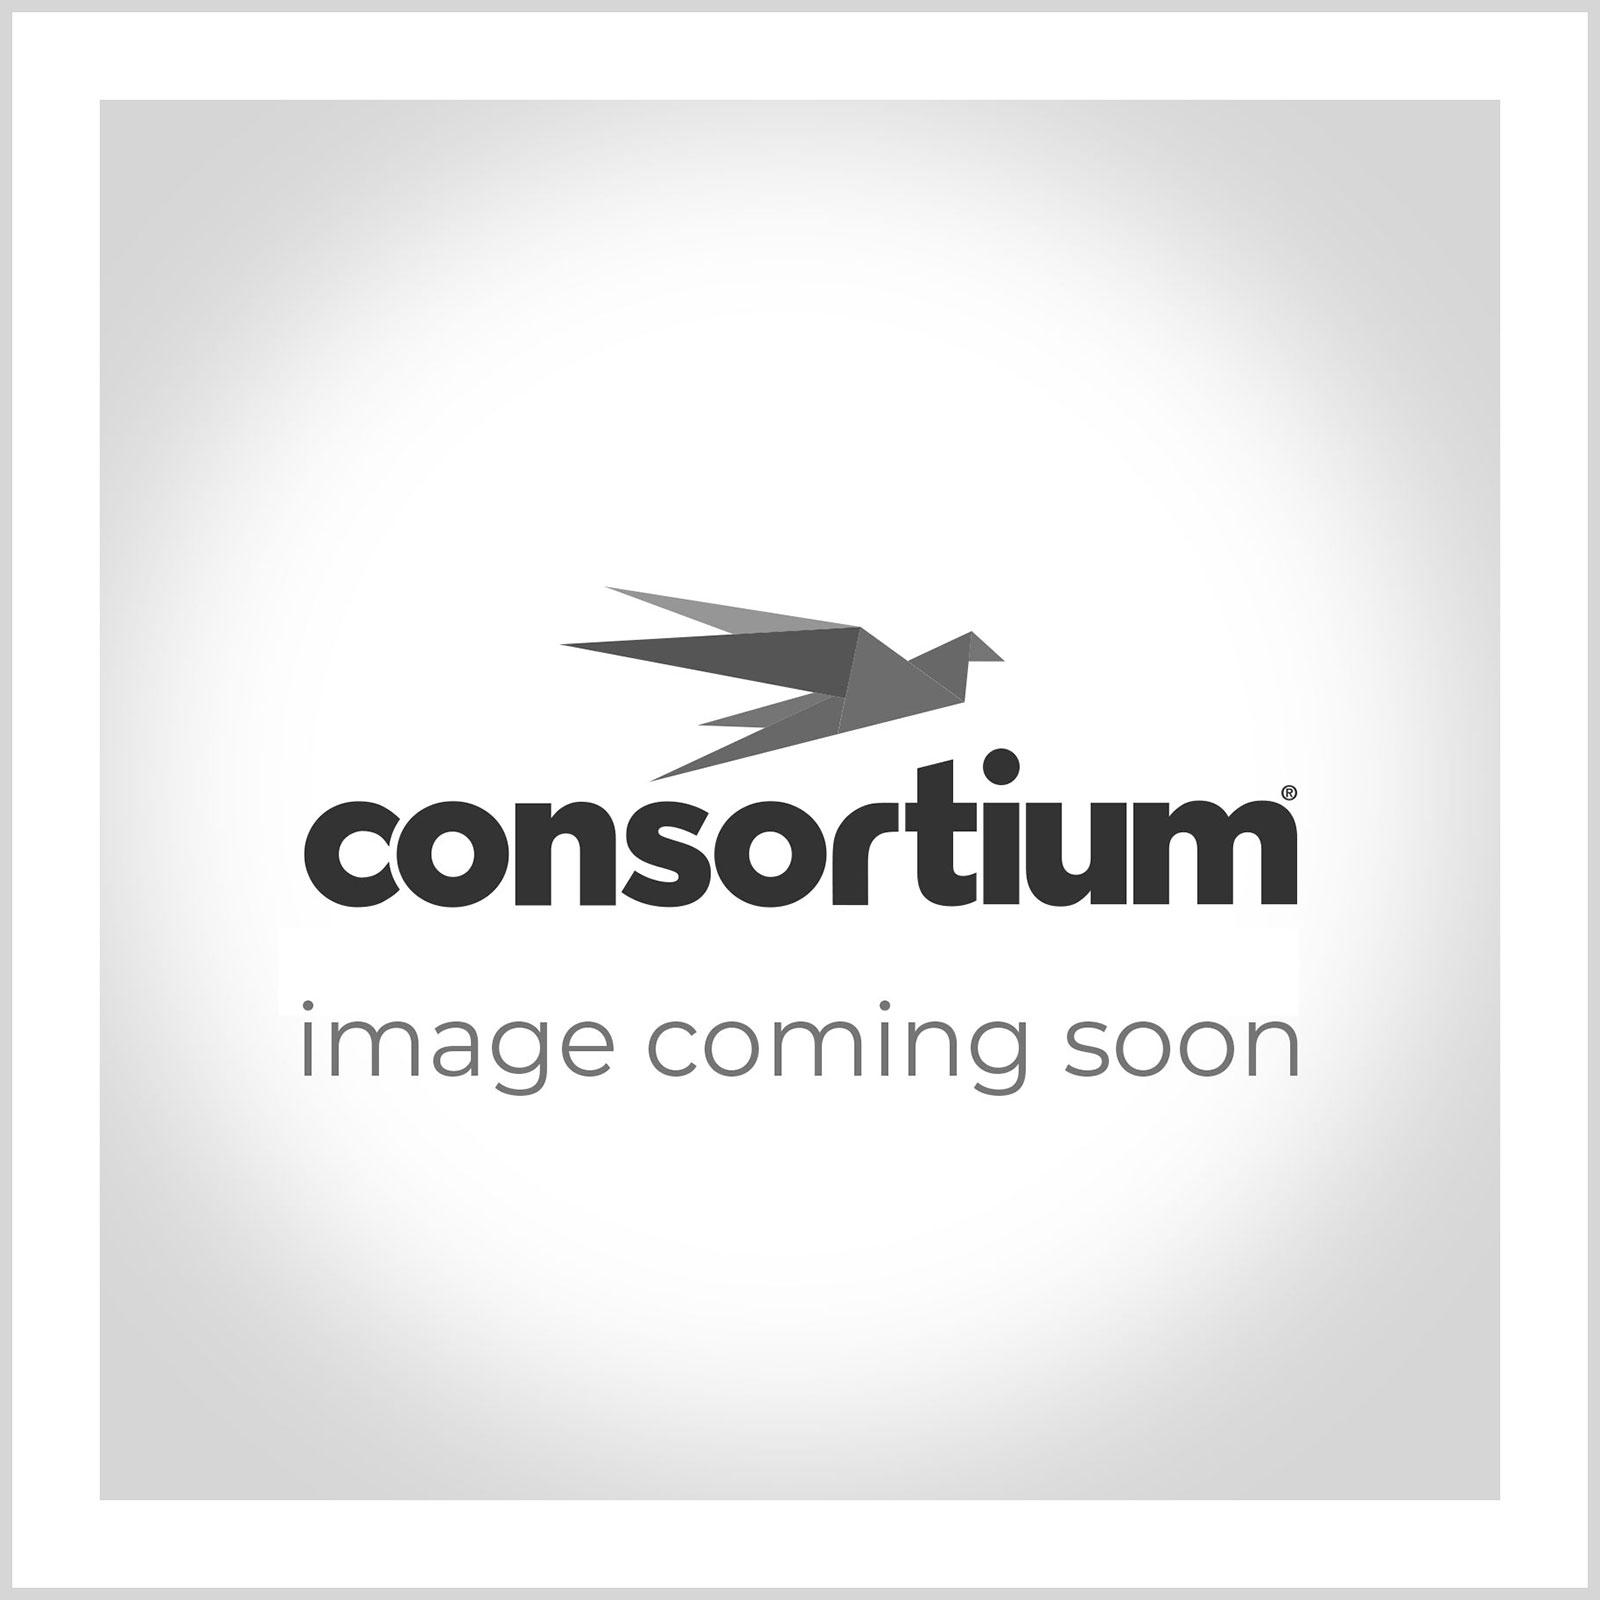 Consortium Robust Headphones Class Pack